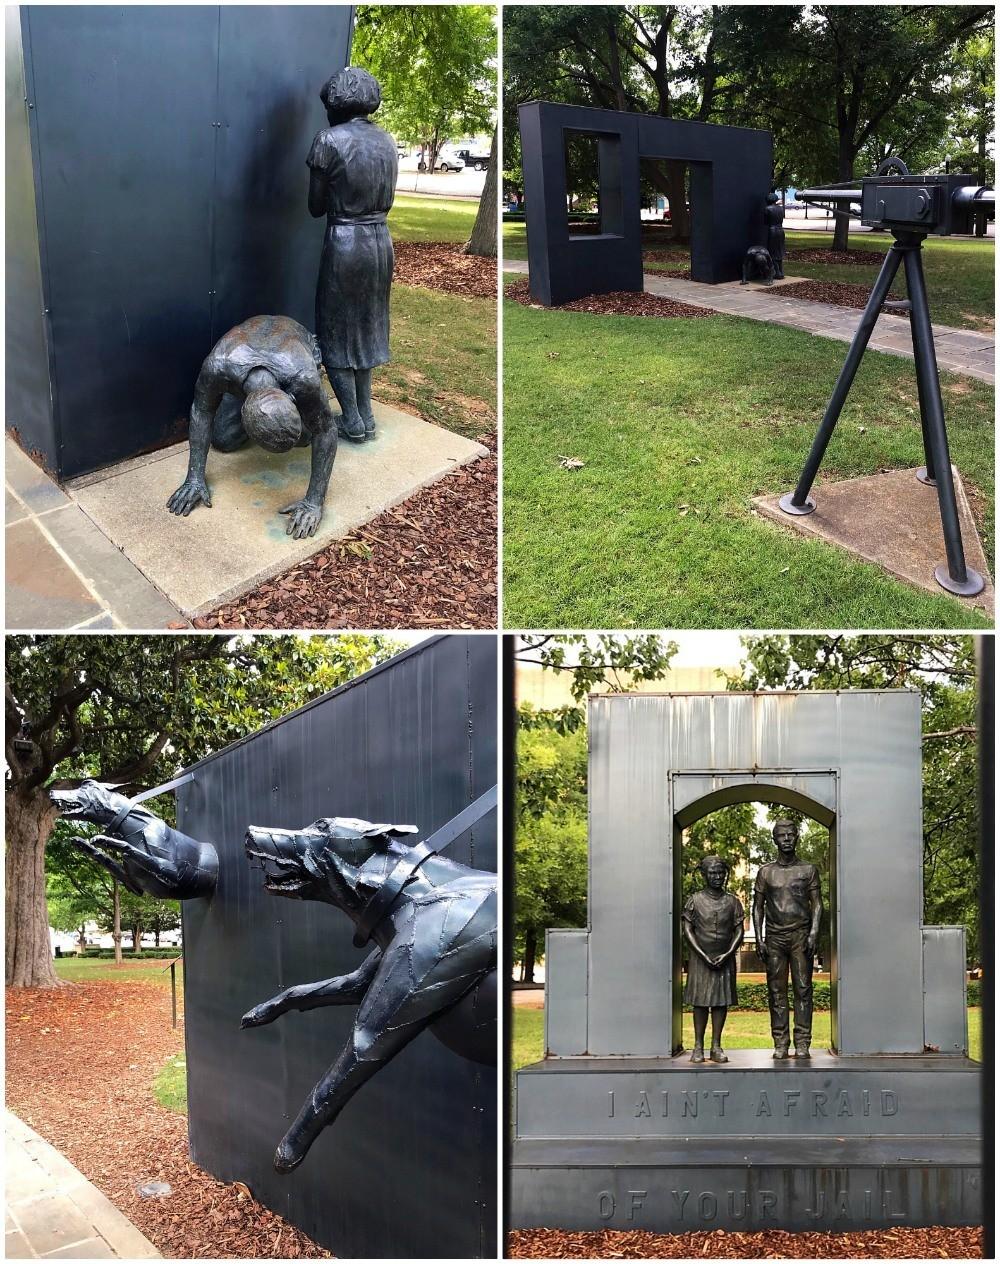 Sculptures in Kelly Ingram park Birmingham Alabama Photo Heatheronhertravels.com